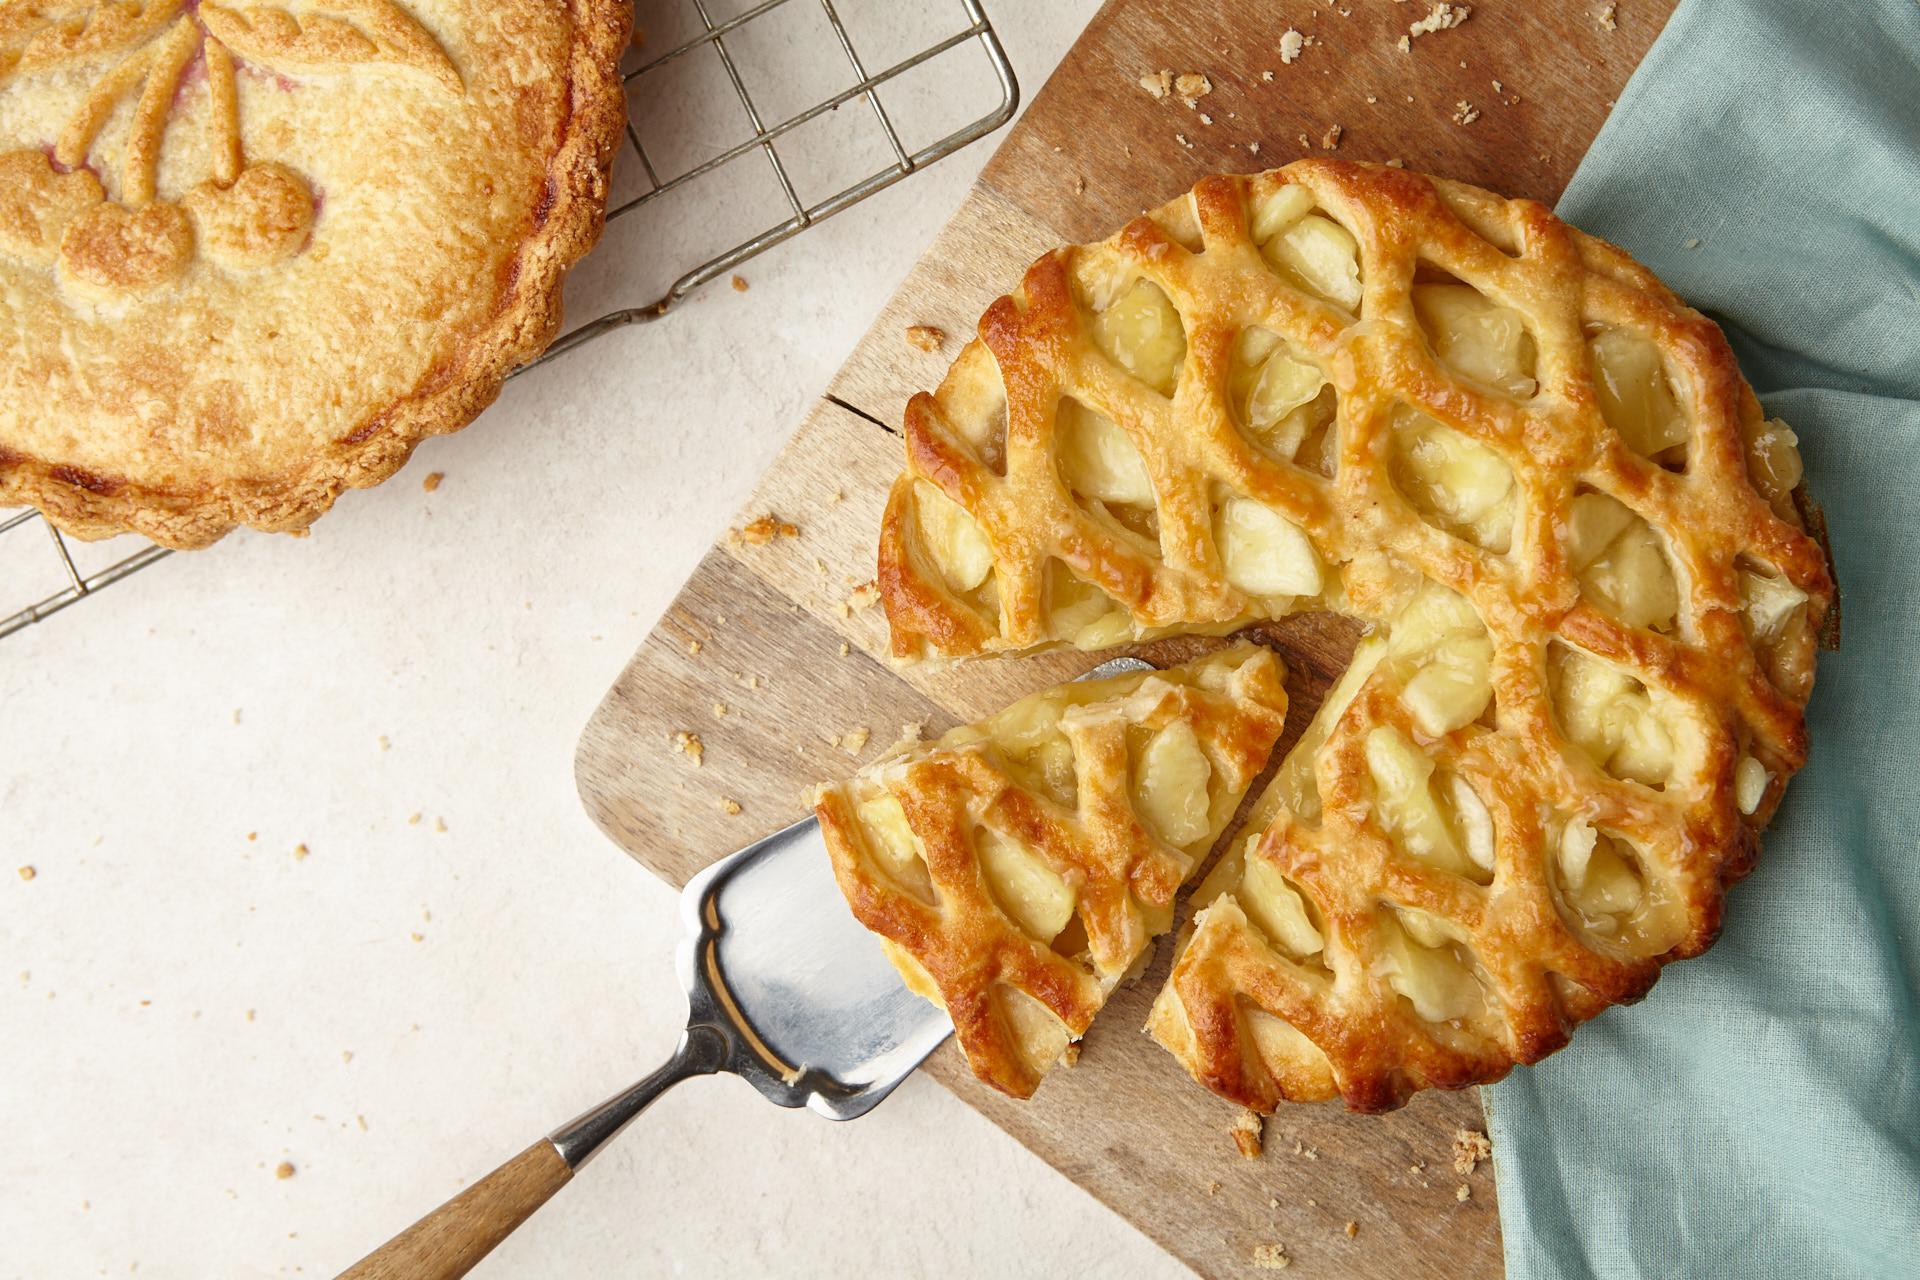 Park Cakes Bakery: Sponge Puddings, Pies, Tarts, Crumbles & Cream Cakes